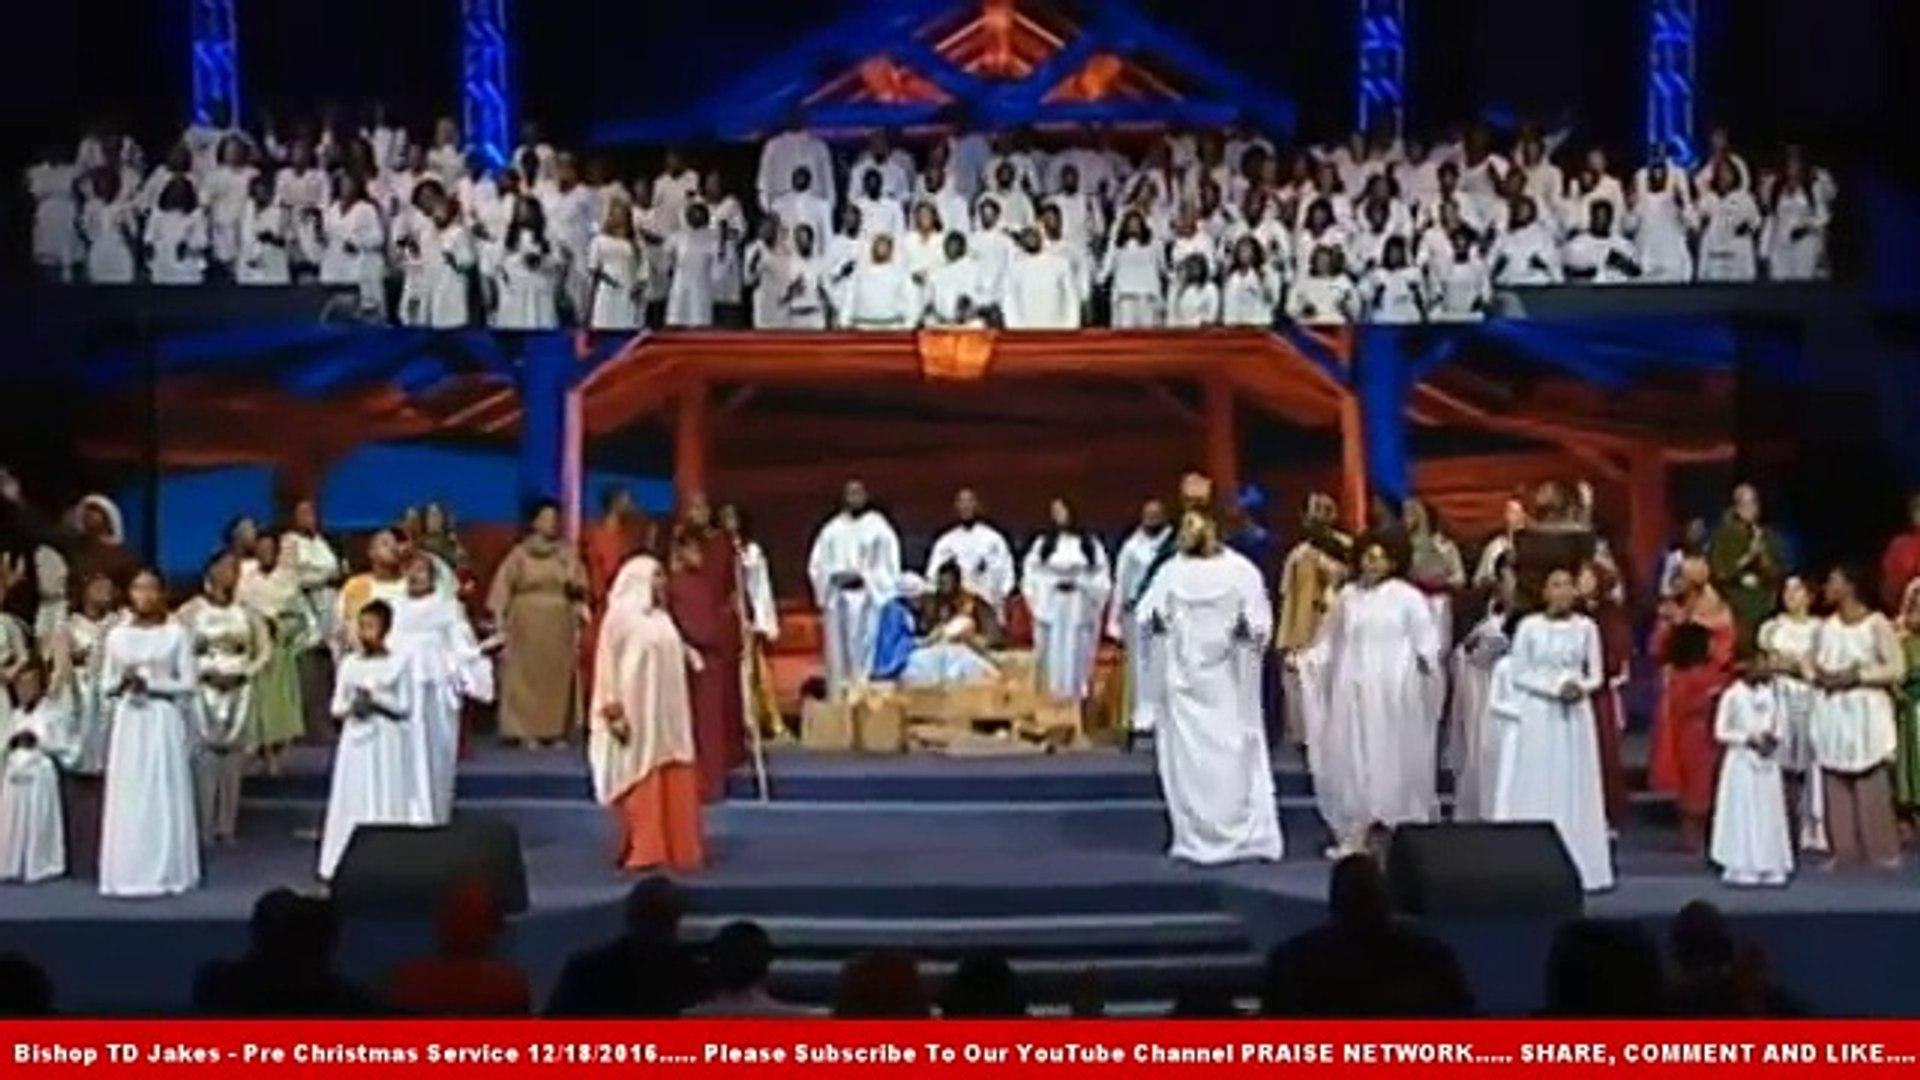 Bishop TD Jakes - Pre Christmas Service 12/18/2016 - Must Watch Sermons